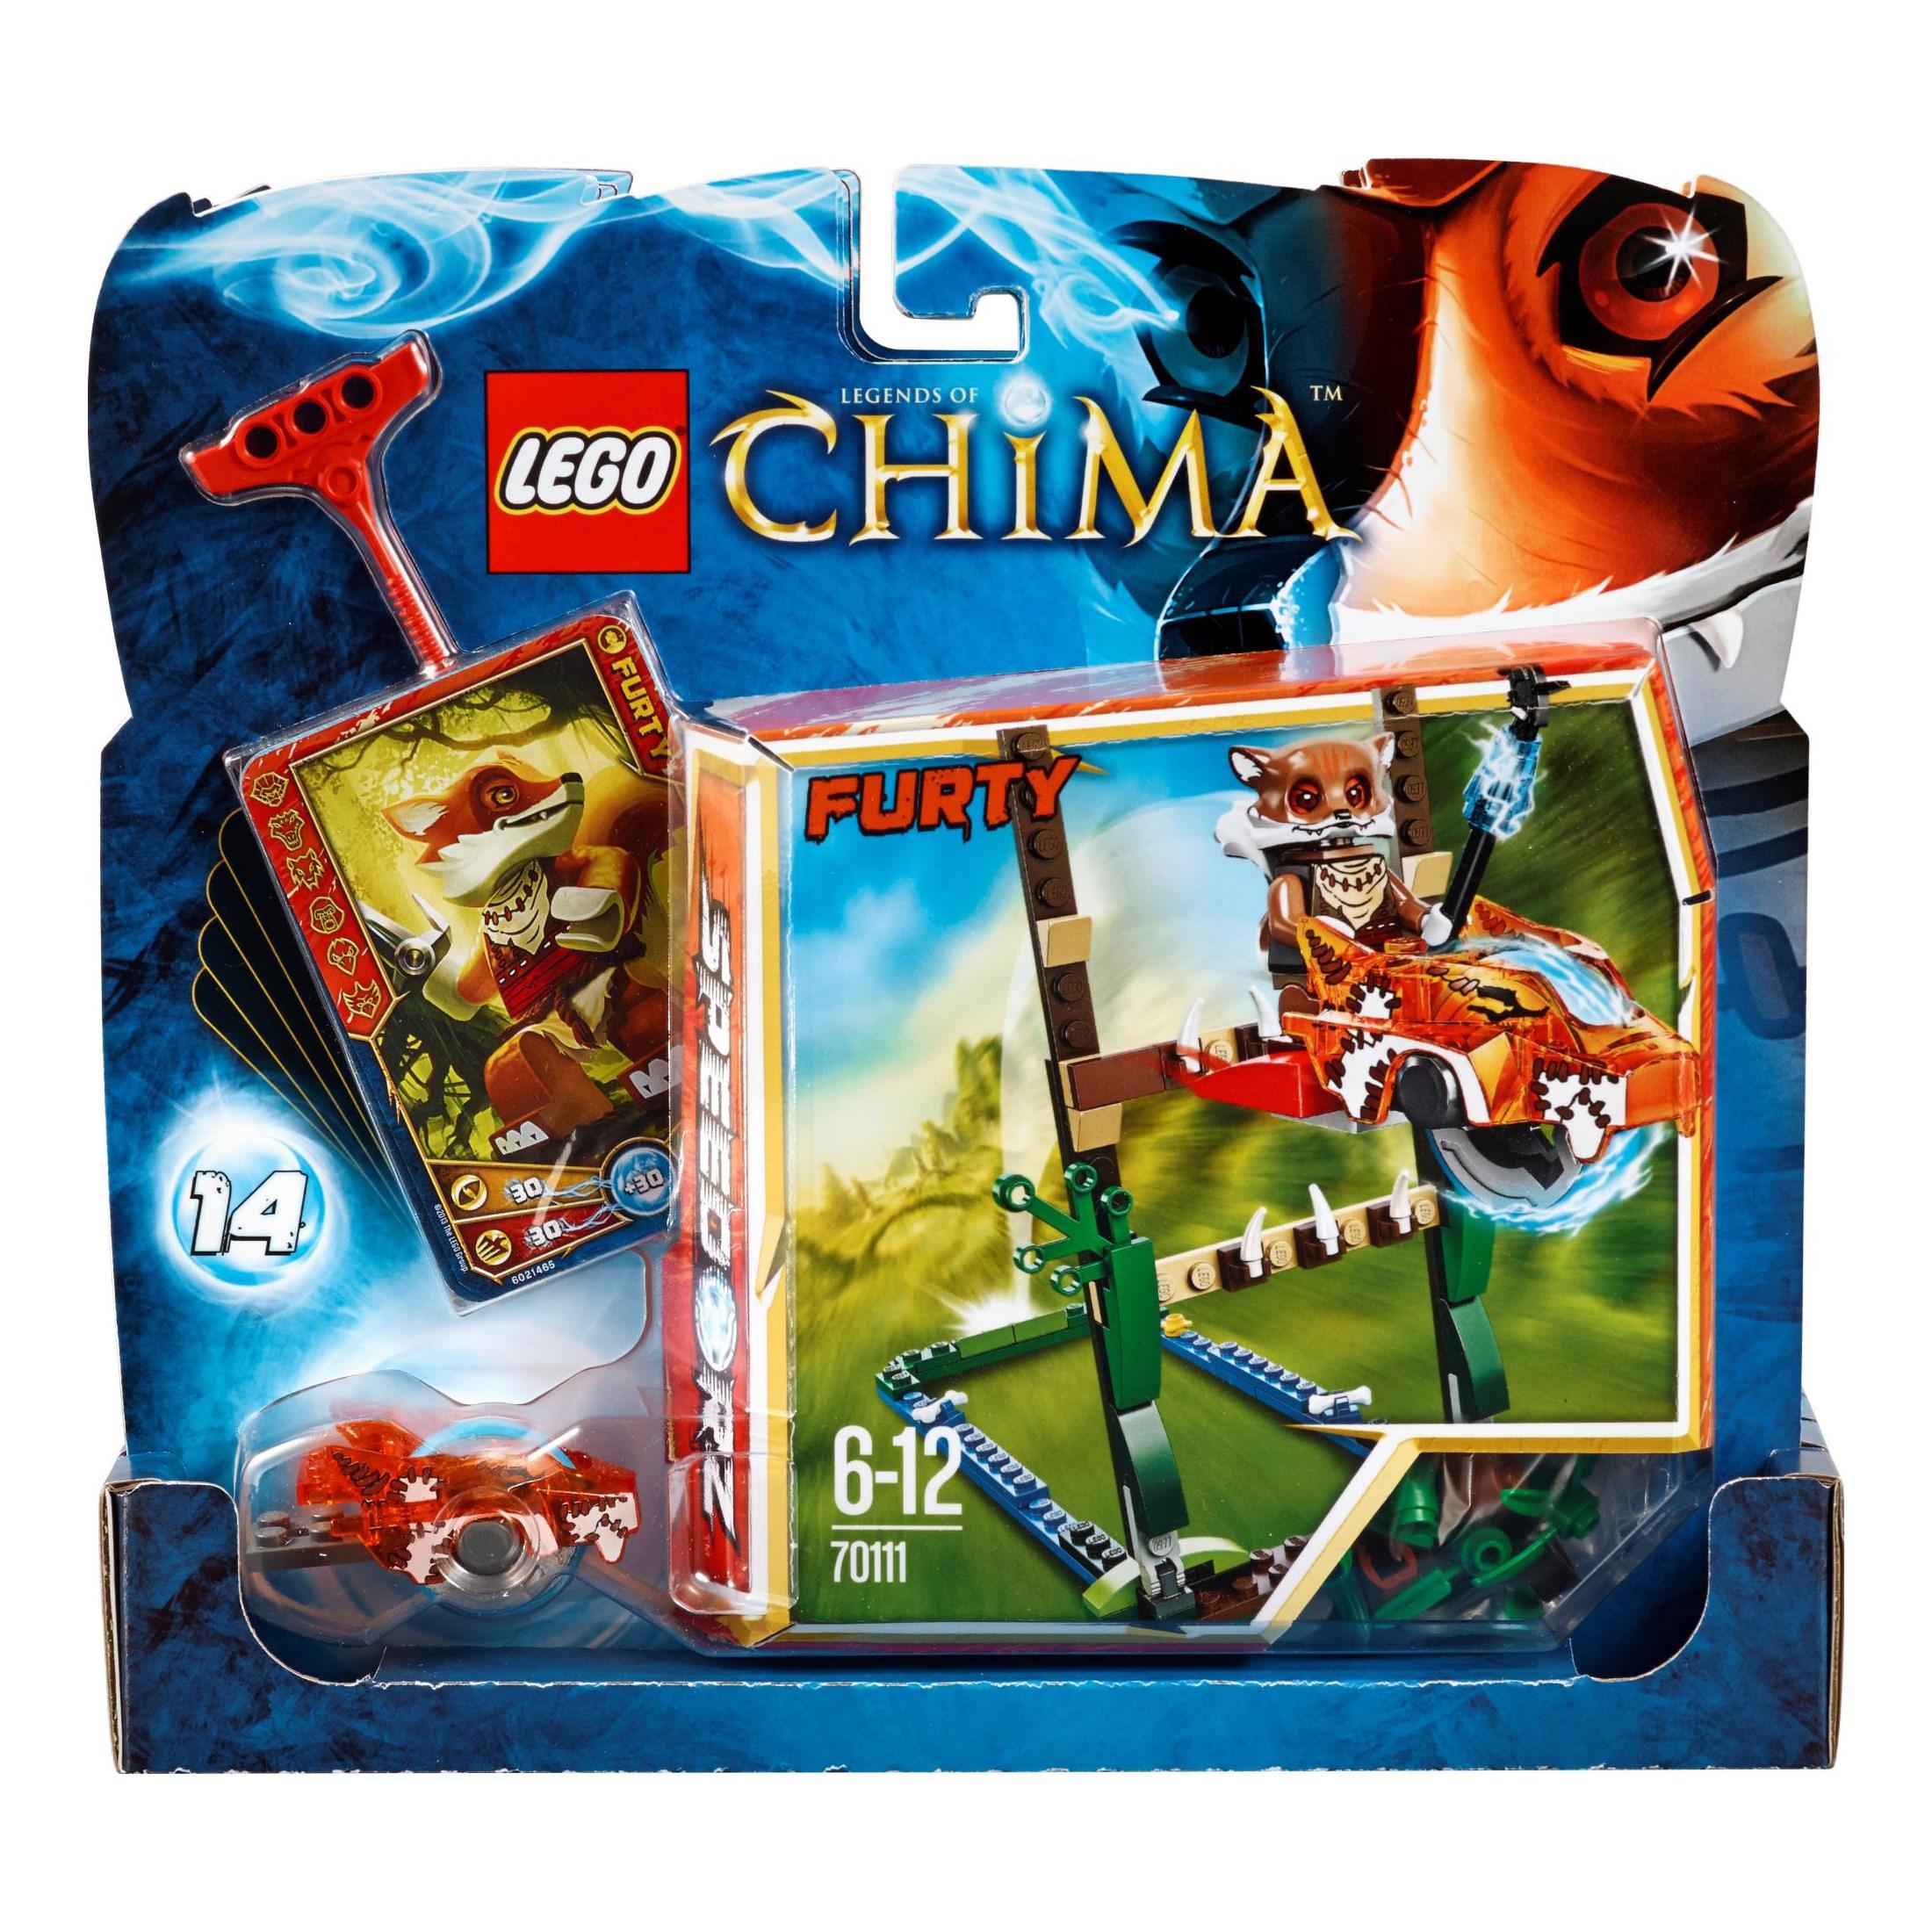 LEGO Chima 70111